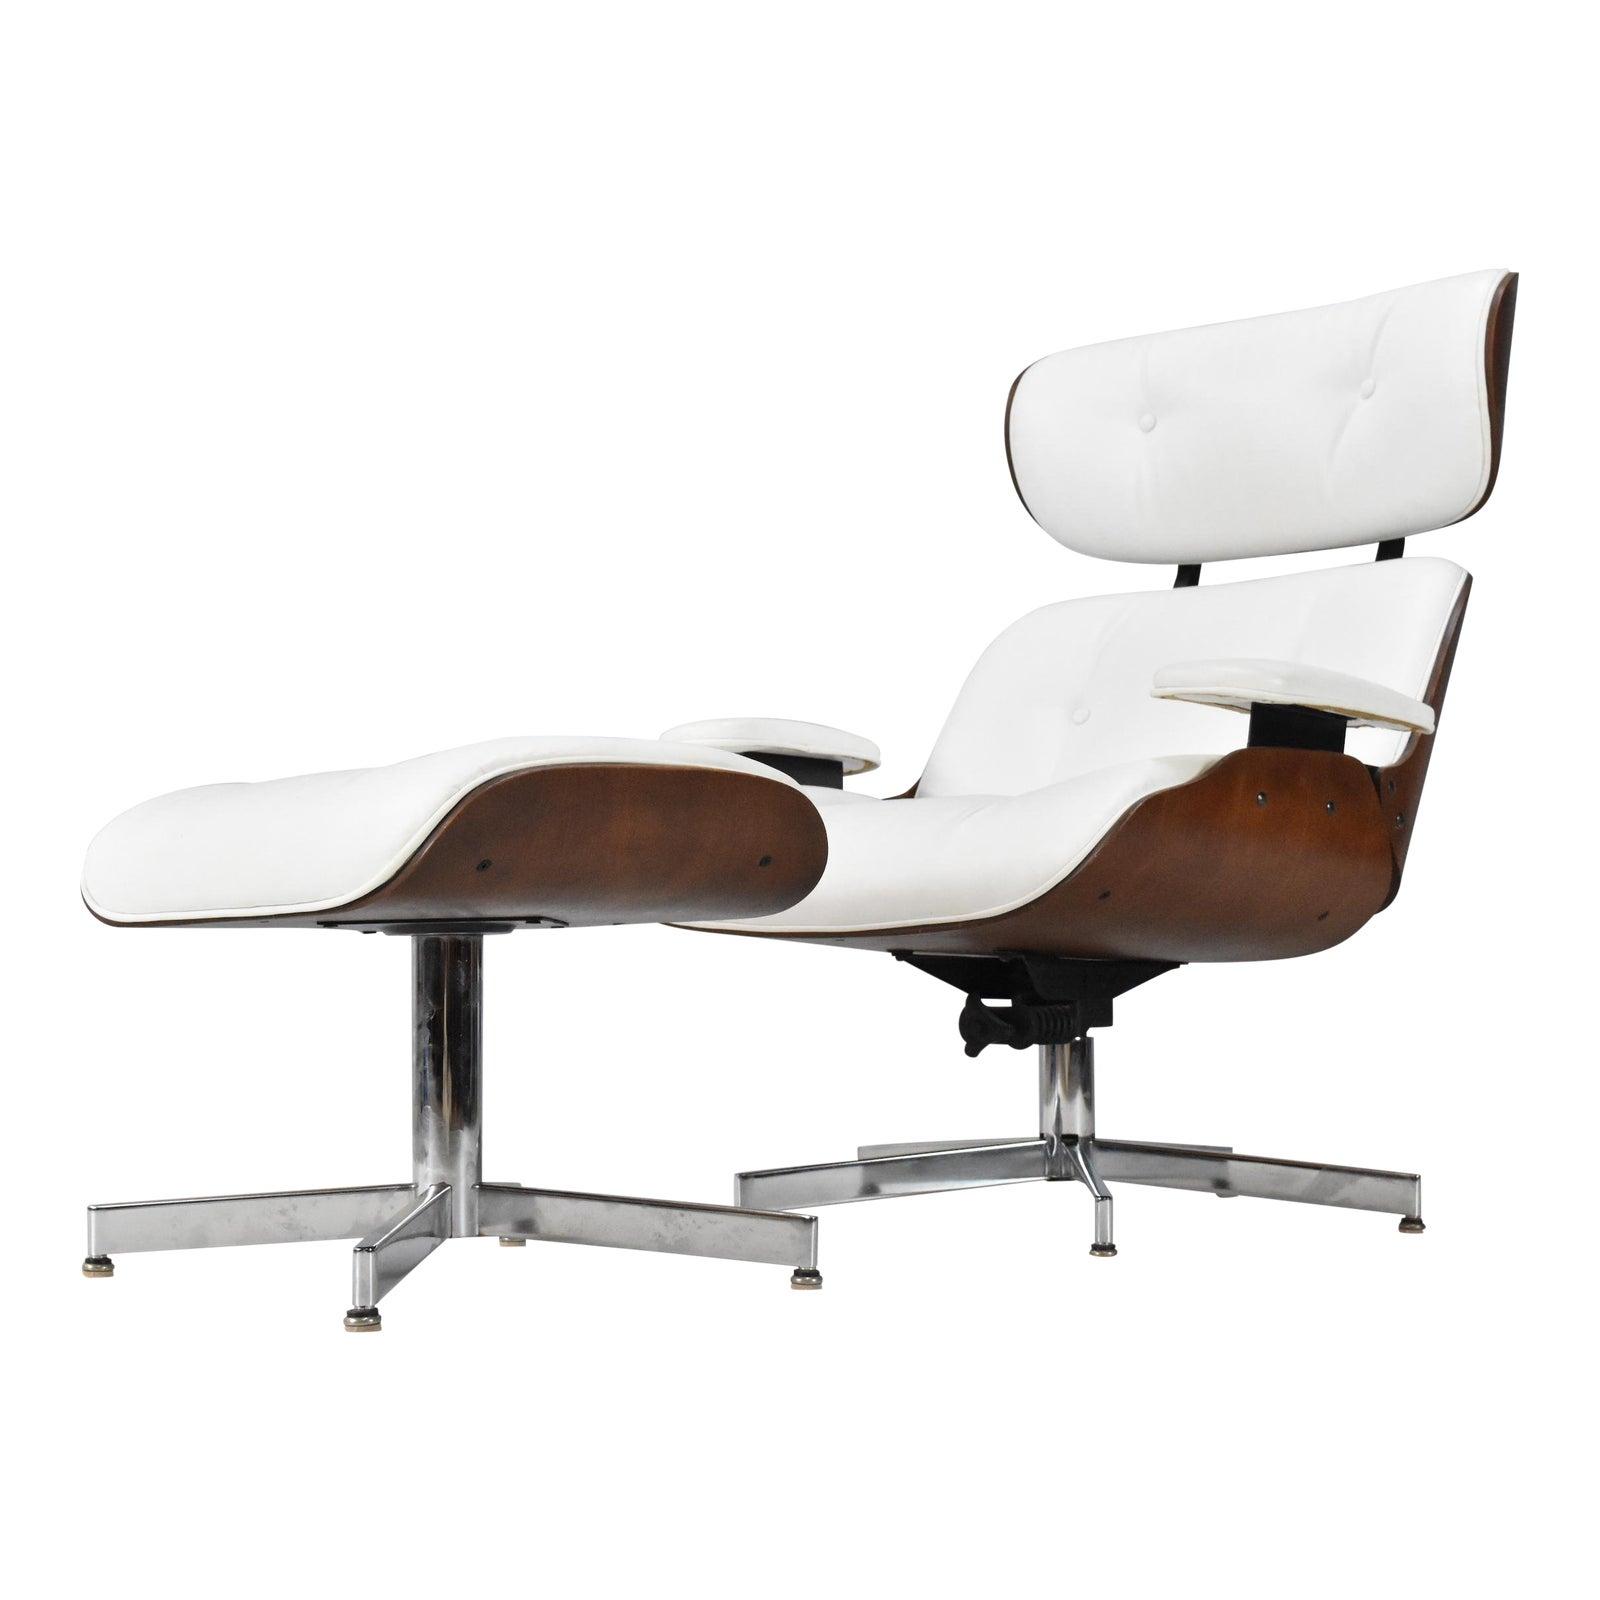 Mid century eames style lounge chair ottoman chairish